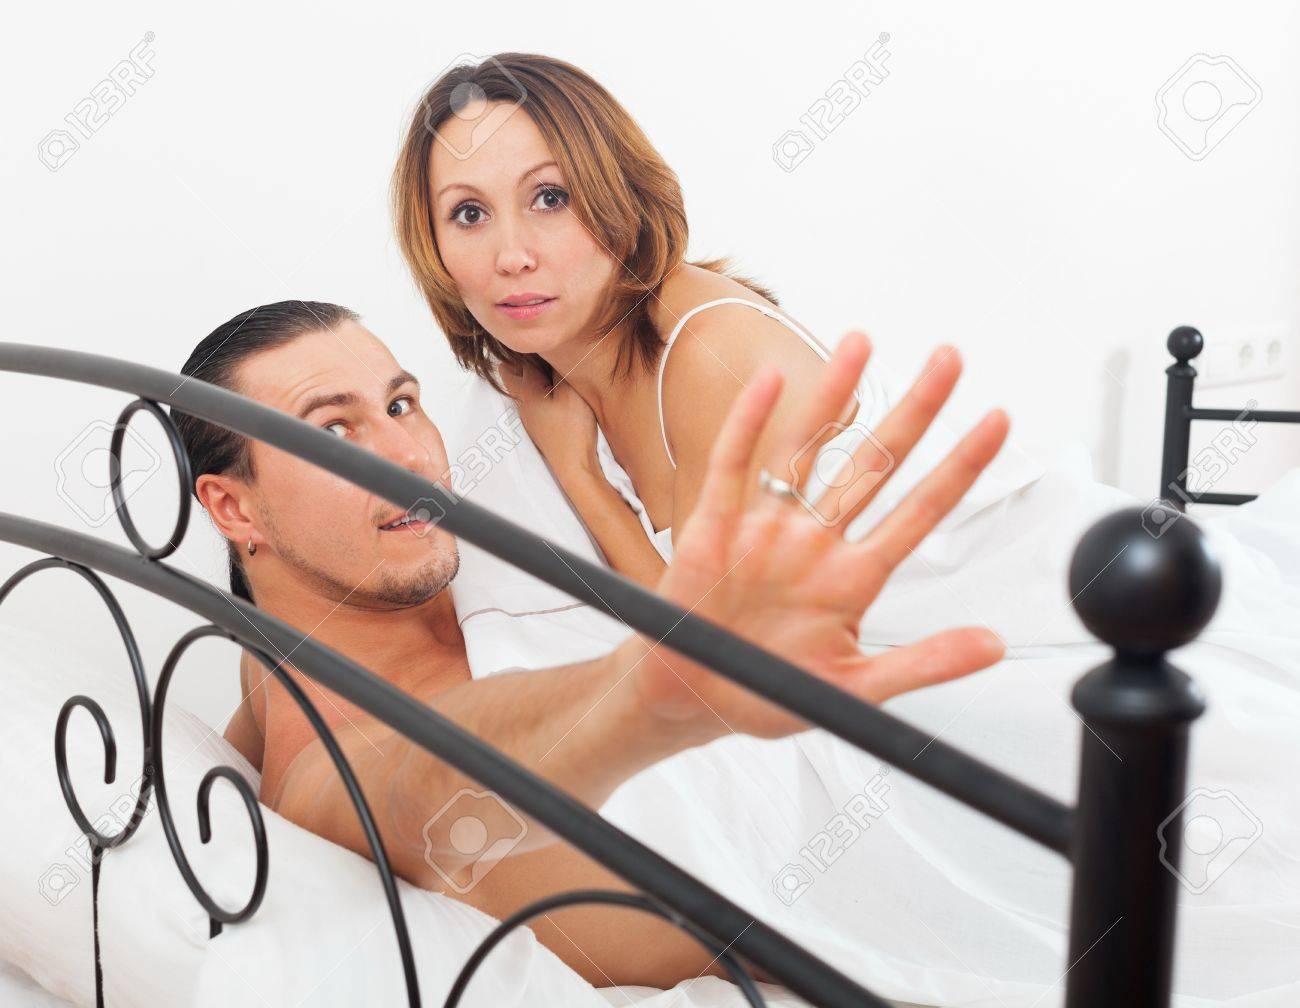 Adultman and woman fucking photos pic 913